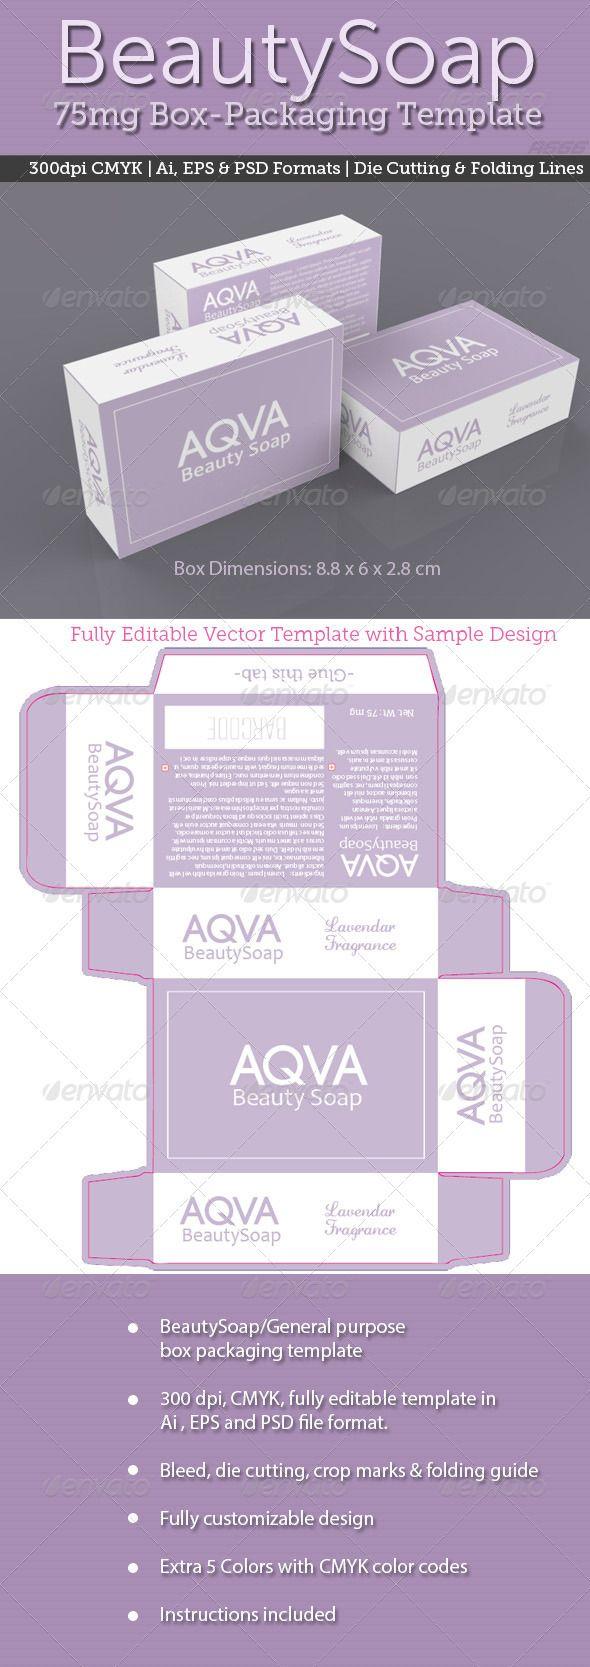 BeautySoap Box Packaging Template - Packaging Print Templates